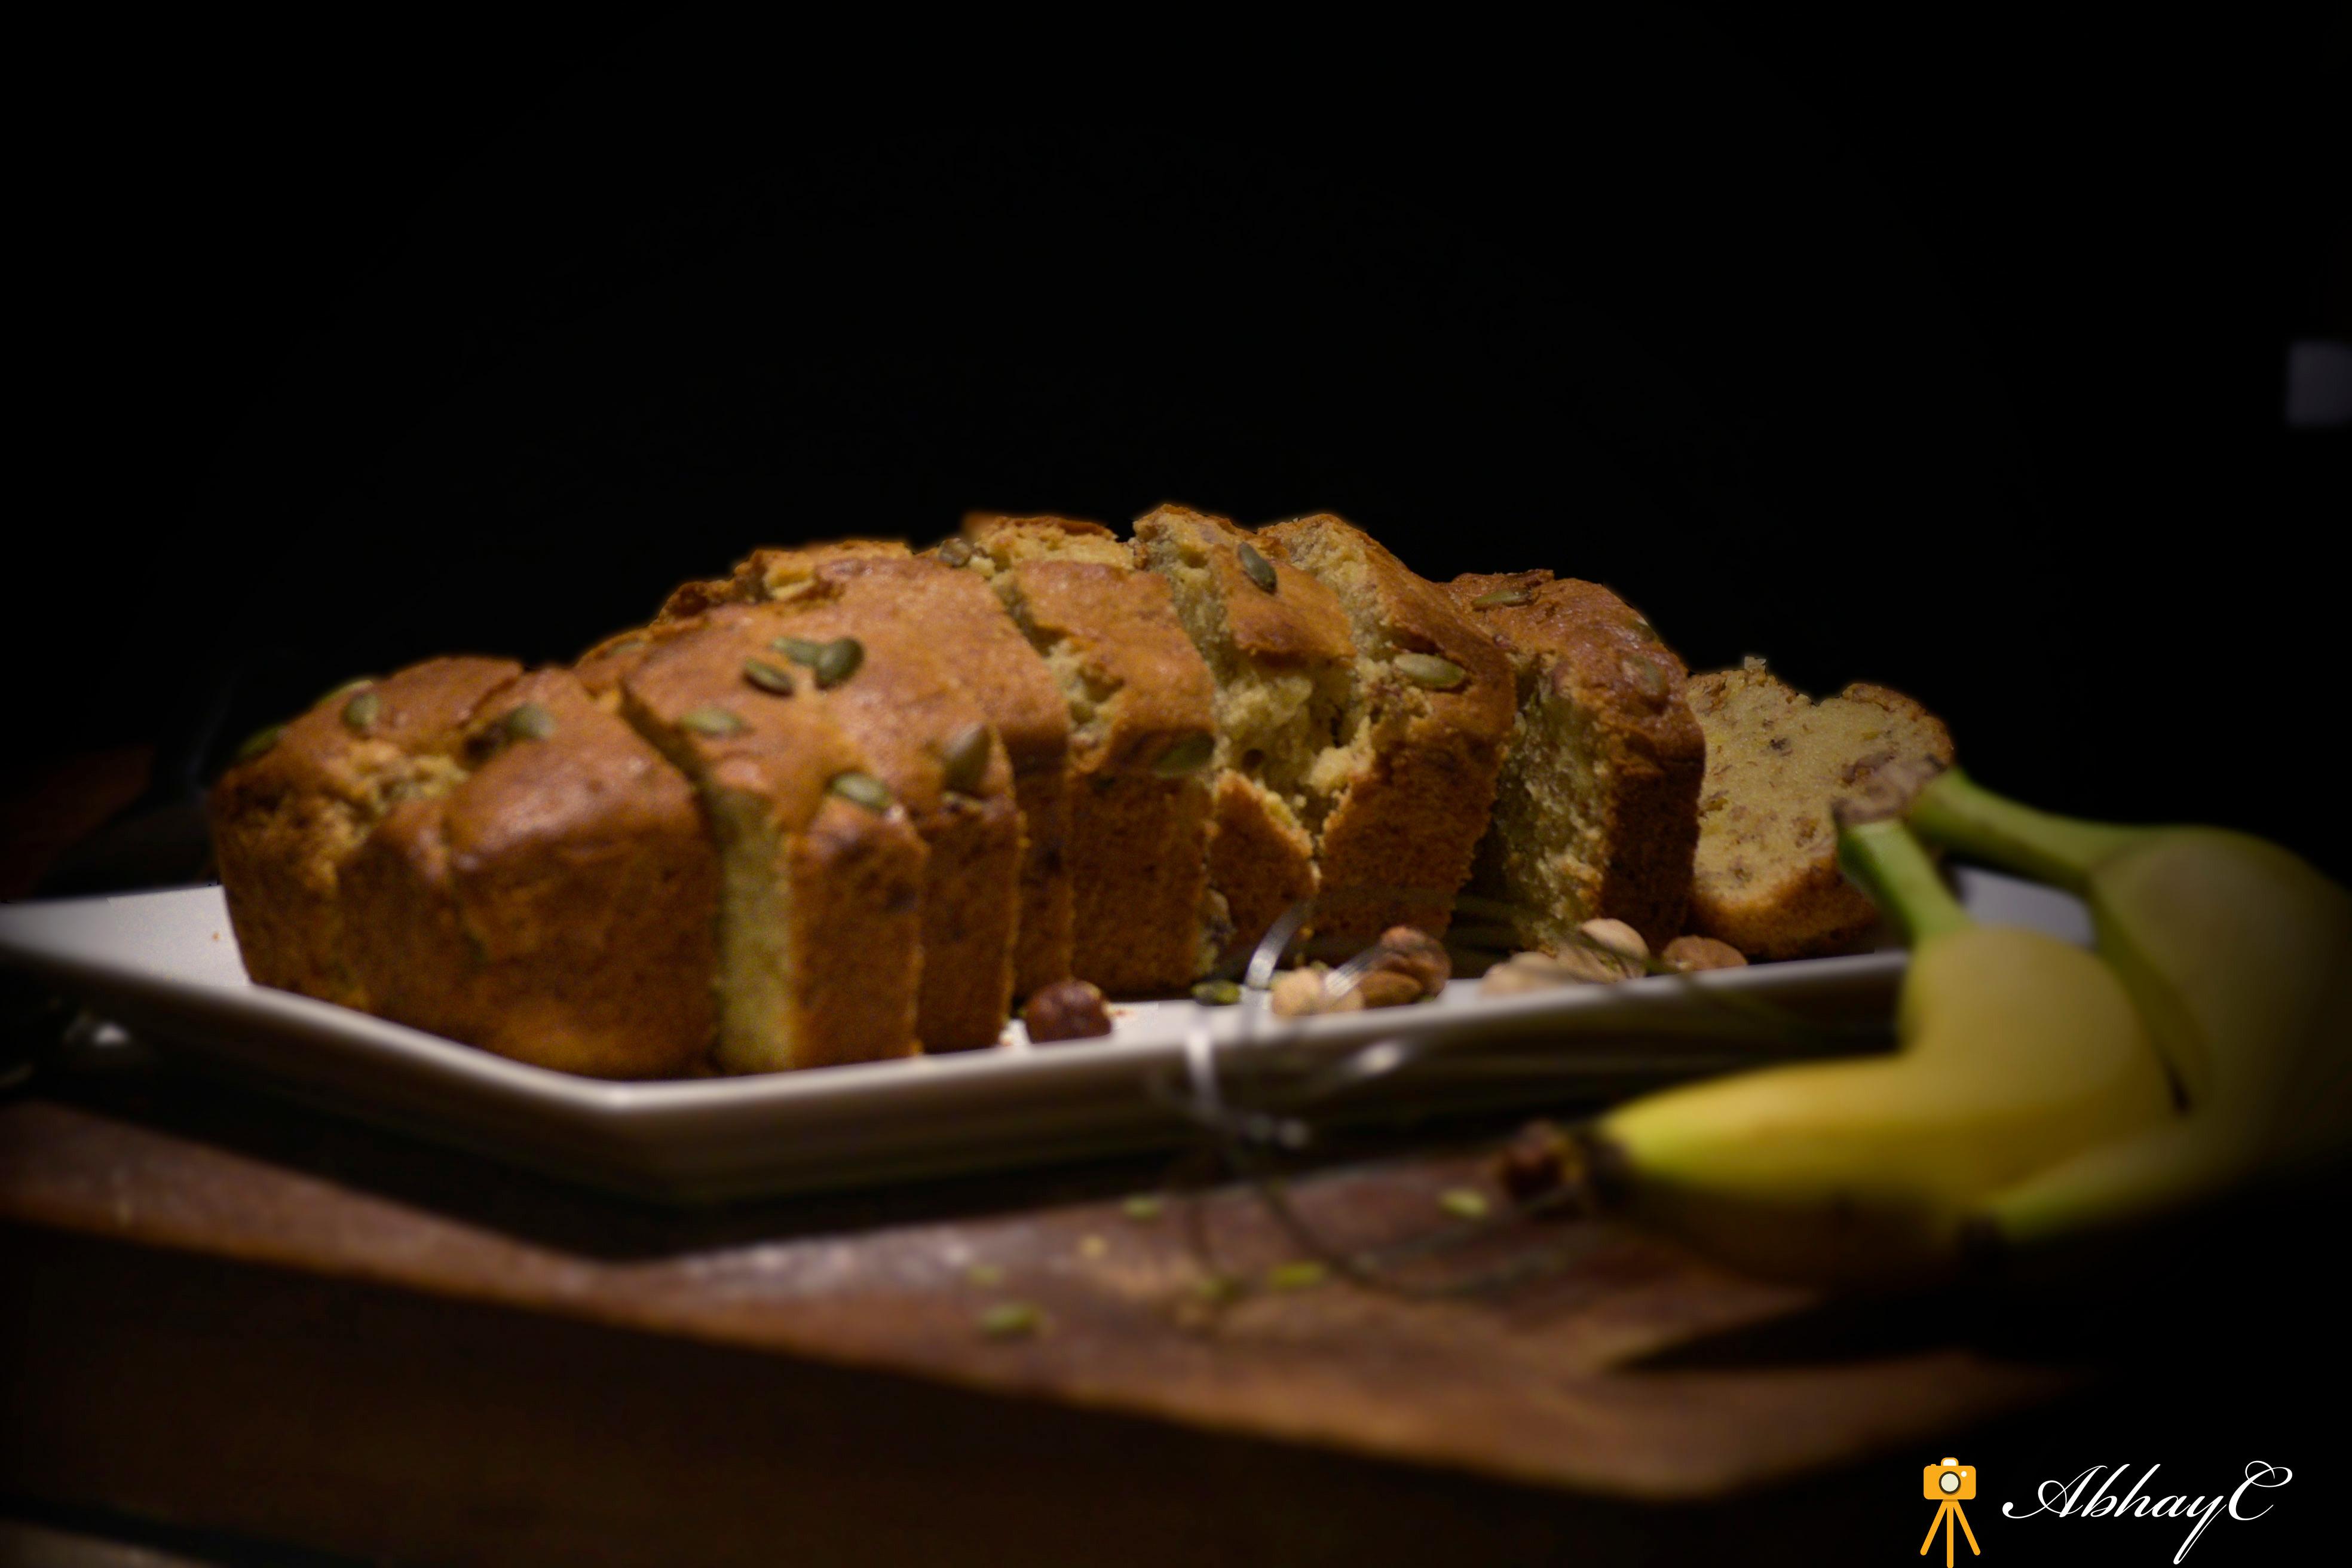 Aromatic Banana & Hazelnut loaf Bread, with Pumpkin seeds!